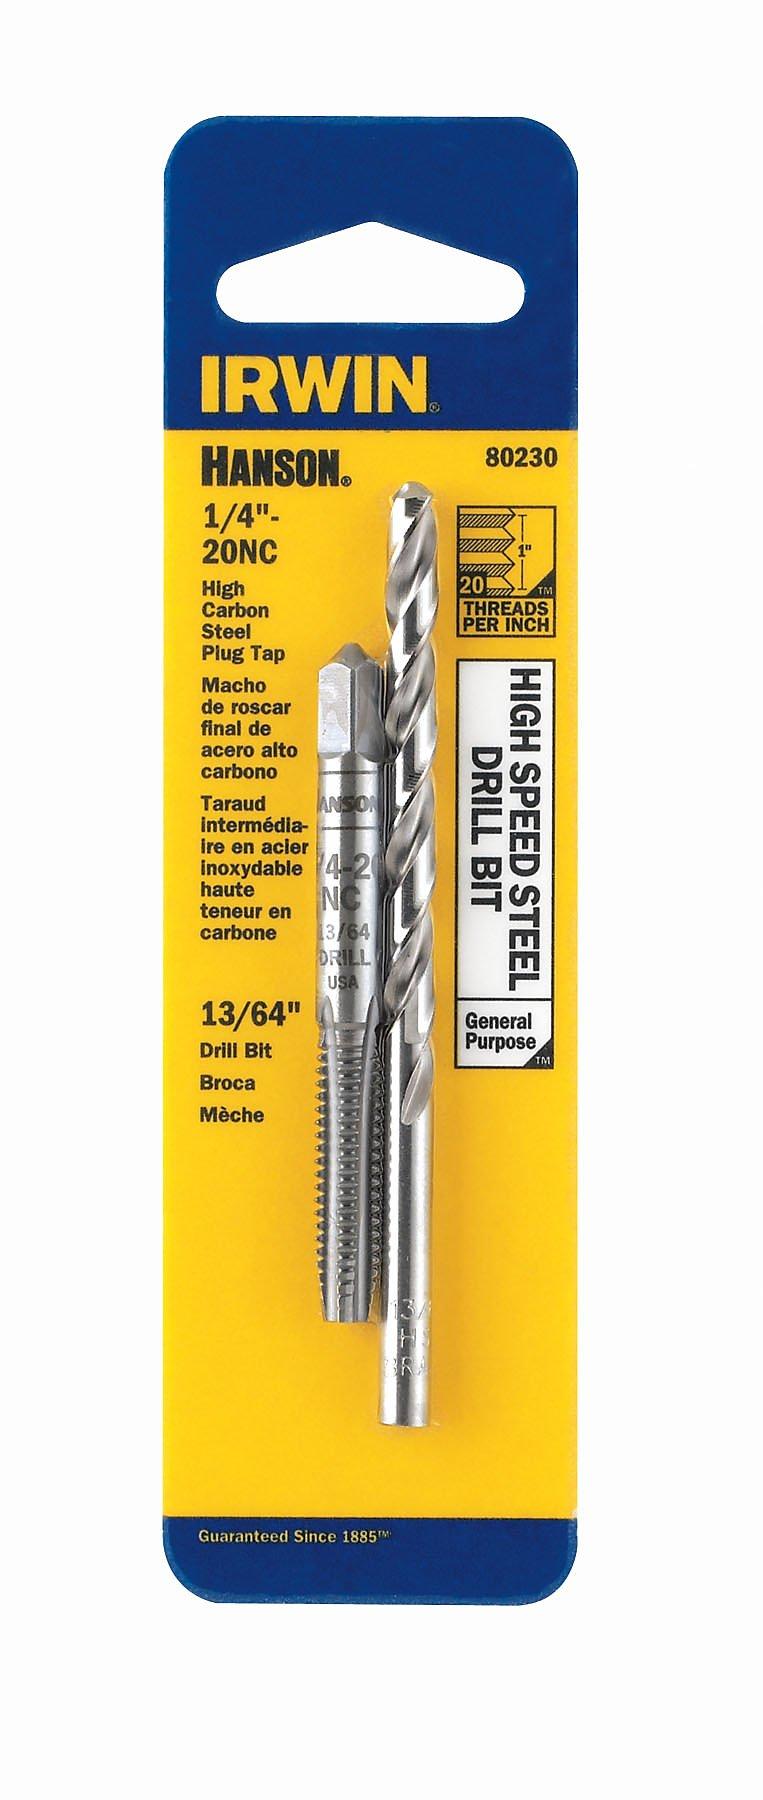 Hanson 3016132 Drill Bit